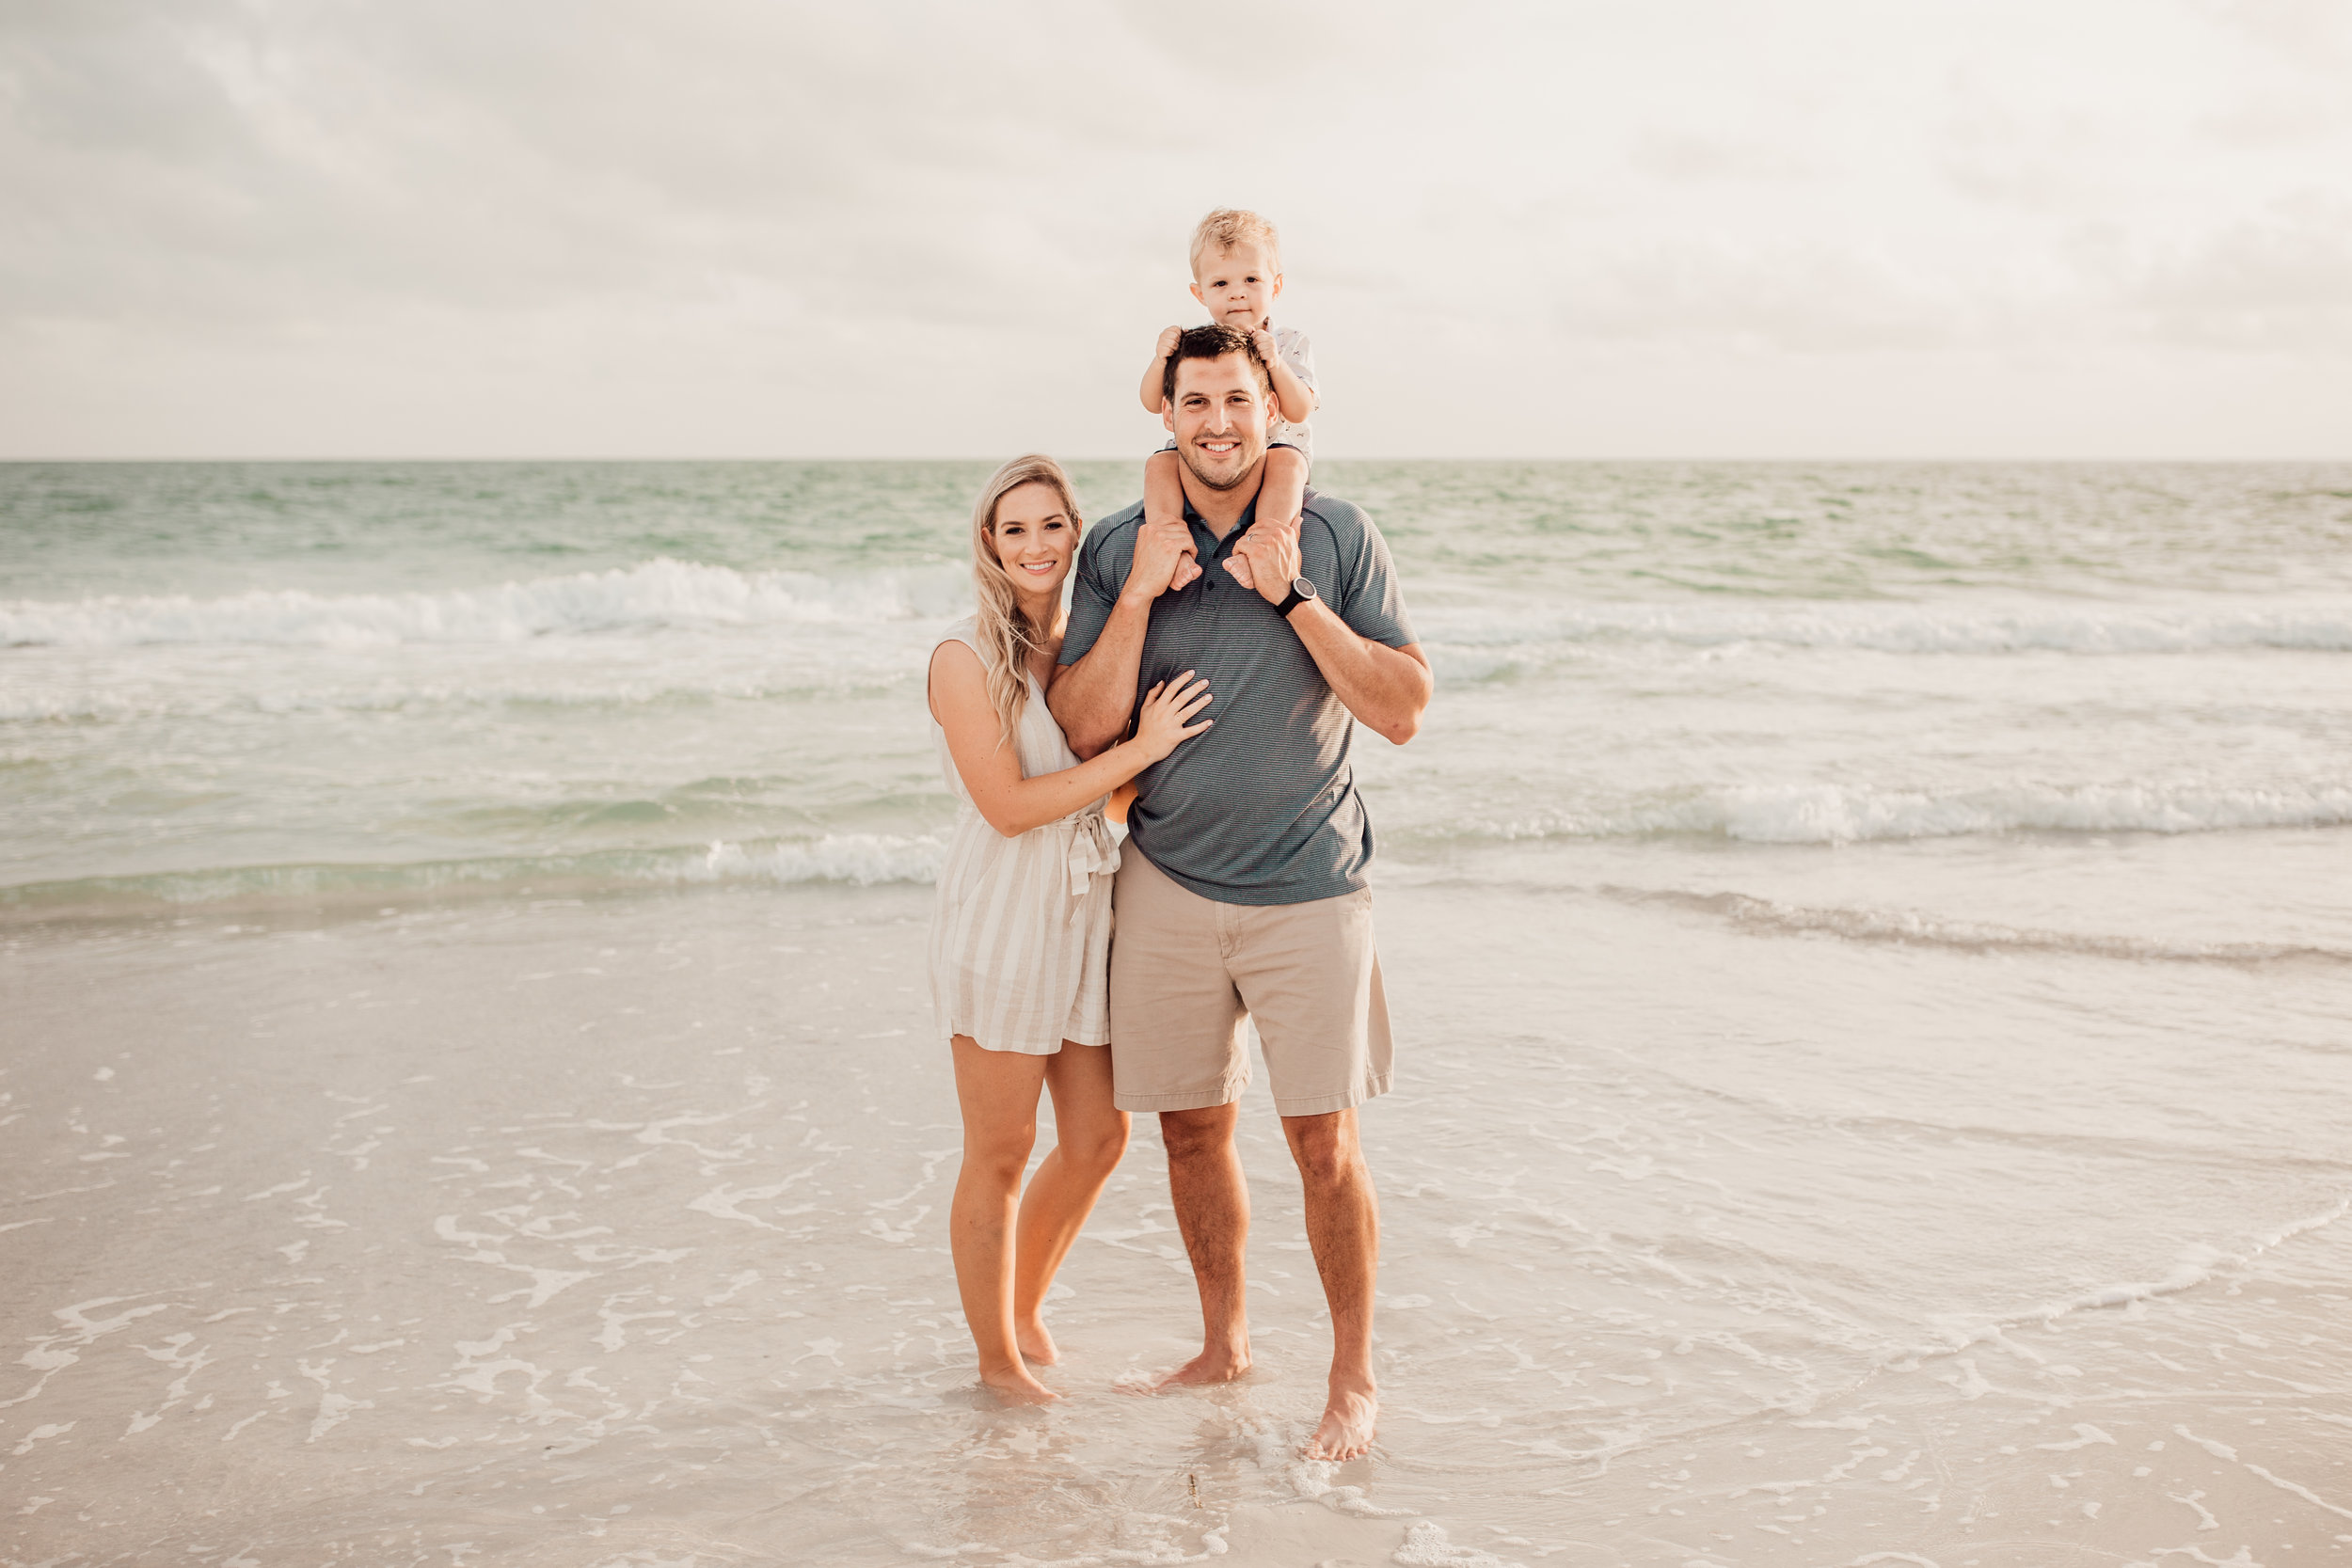 Siesta Key Photographer | Anna Maria Island Photographer | Sarasota Photographer | Grace and Fire Photography